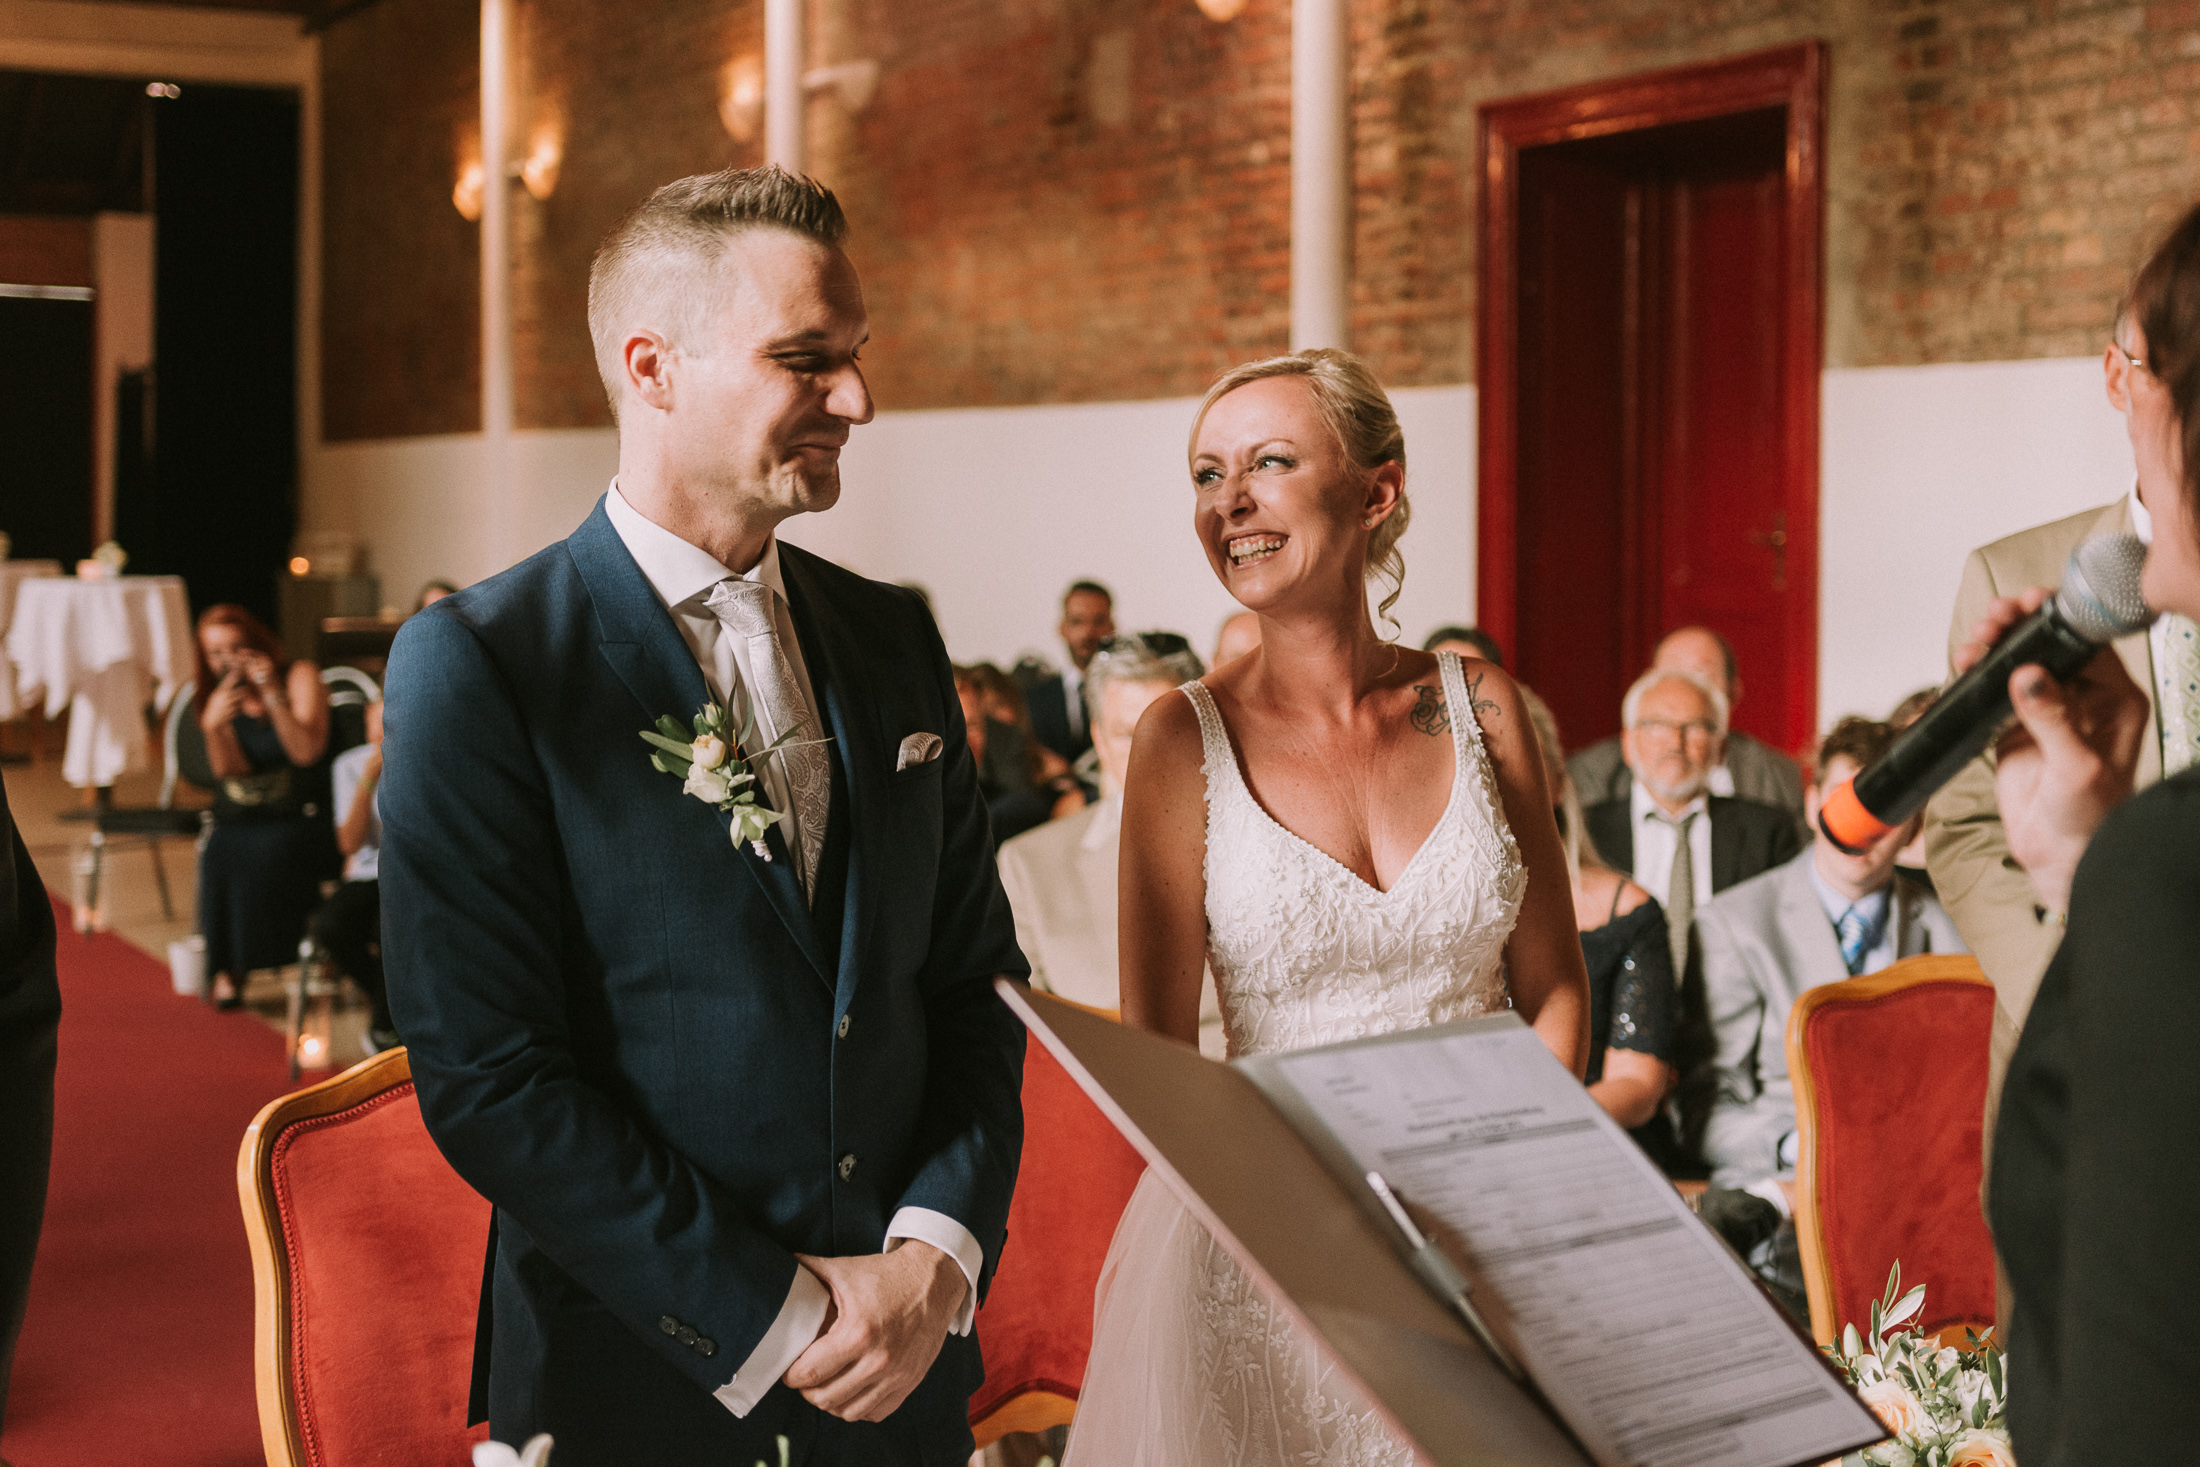 SebastianDon-Hochzeitsfotograf-Wien Umgebung-12.jpg